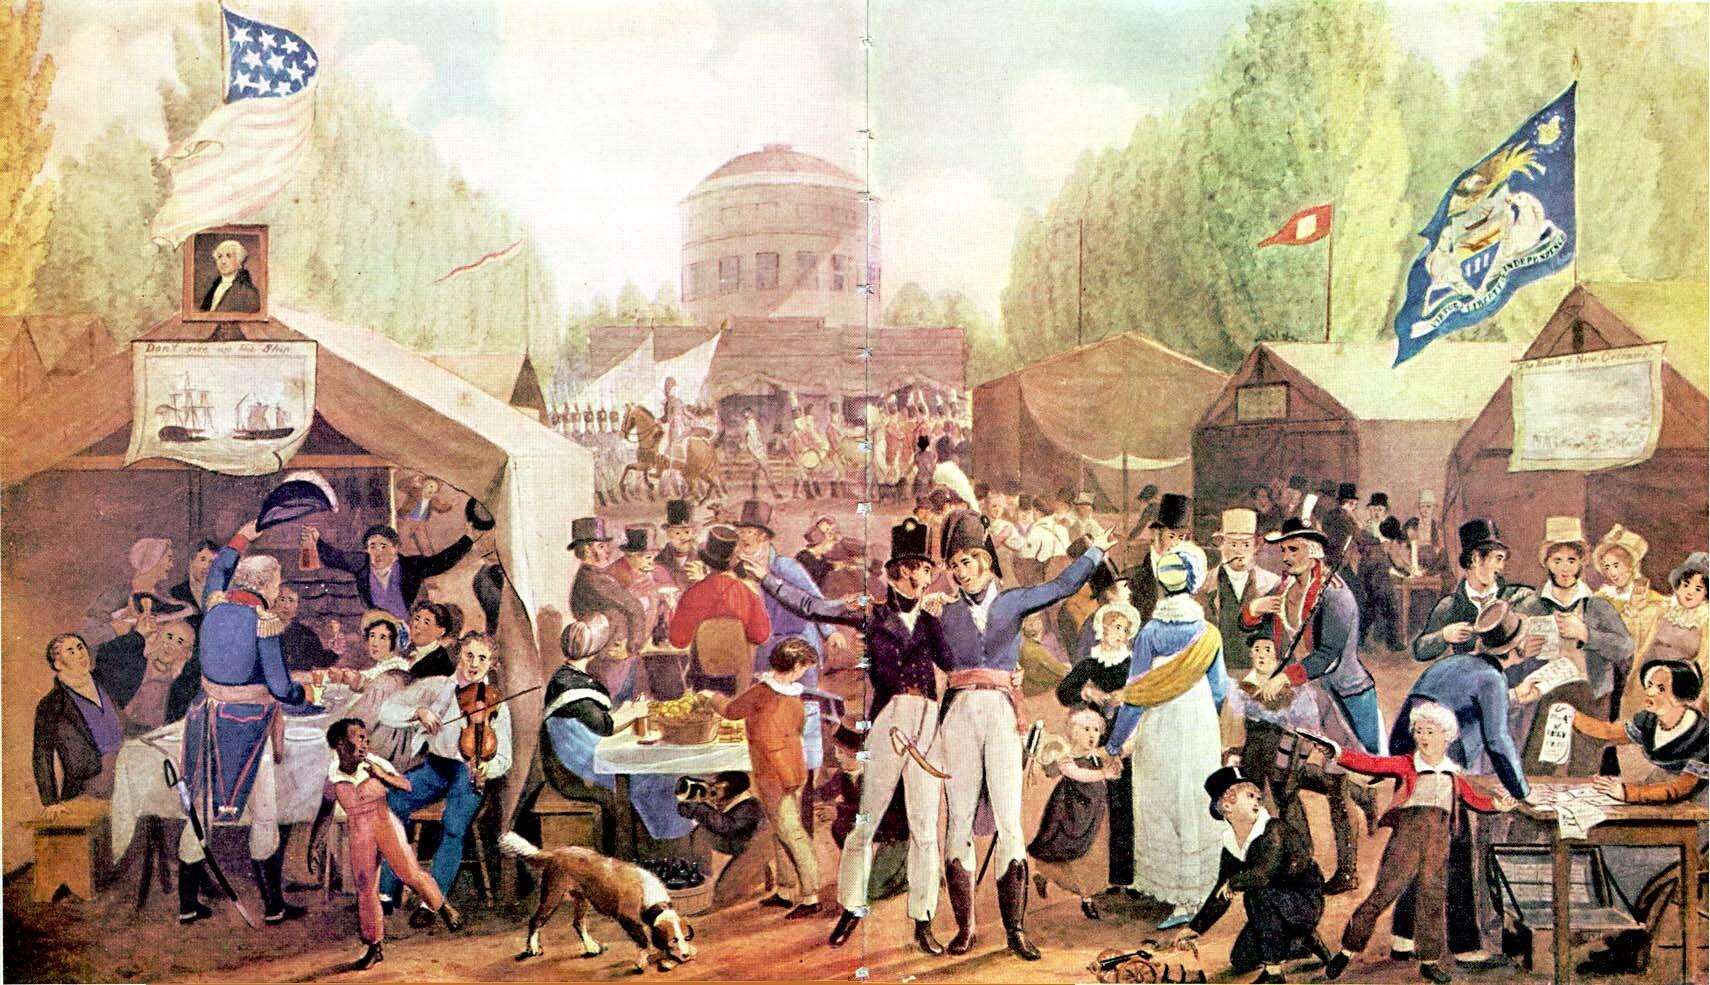 4th-of-July-1819-Philadelphia-John-Lewis-Krimmel